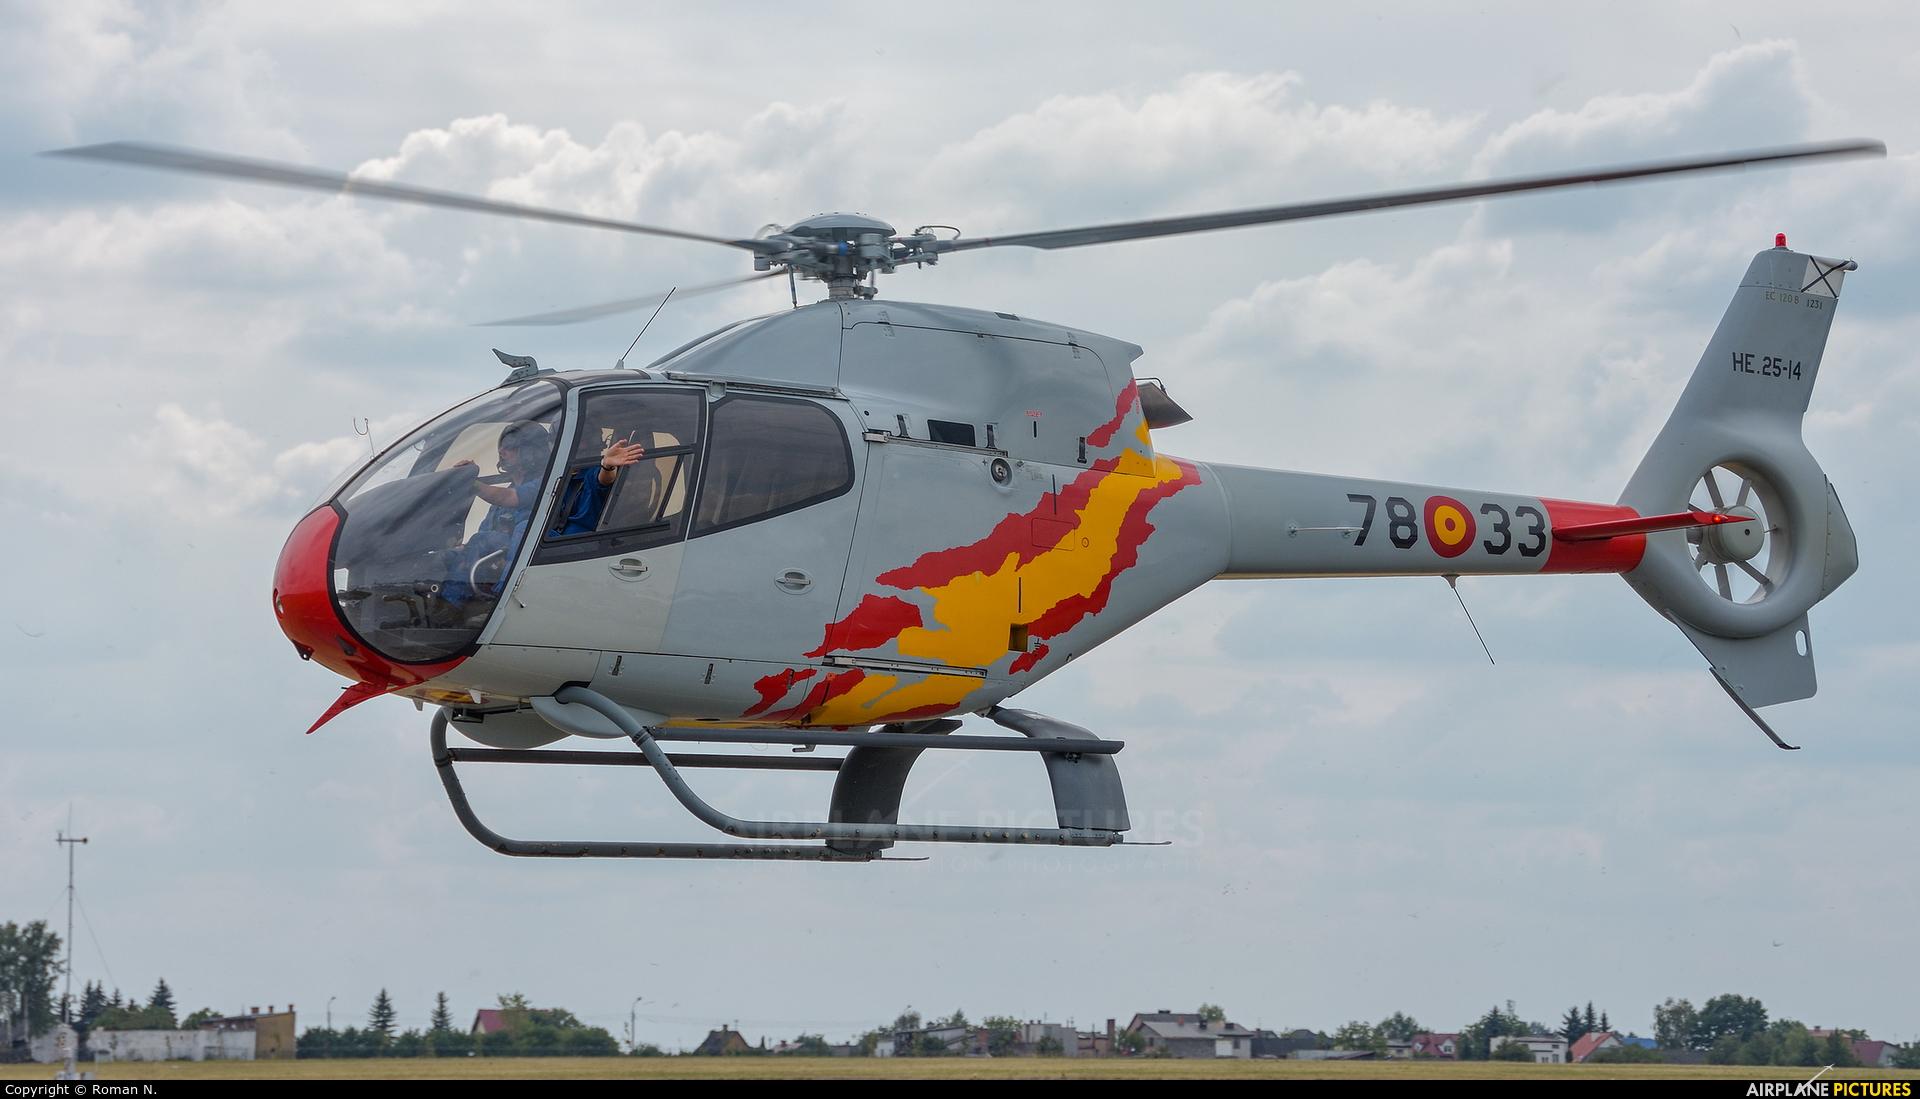 Spain - Air Force: Patrulla ASPA HE.25-14 aircraft at Radom - Sadków